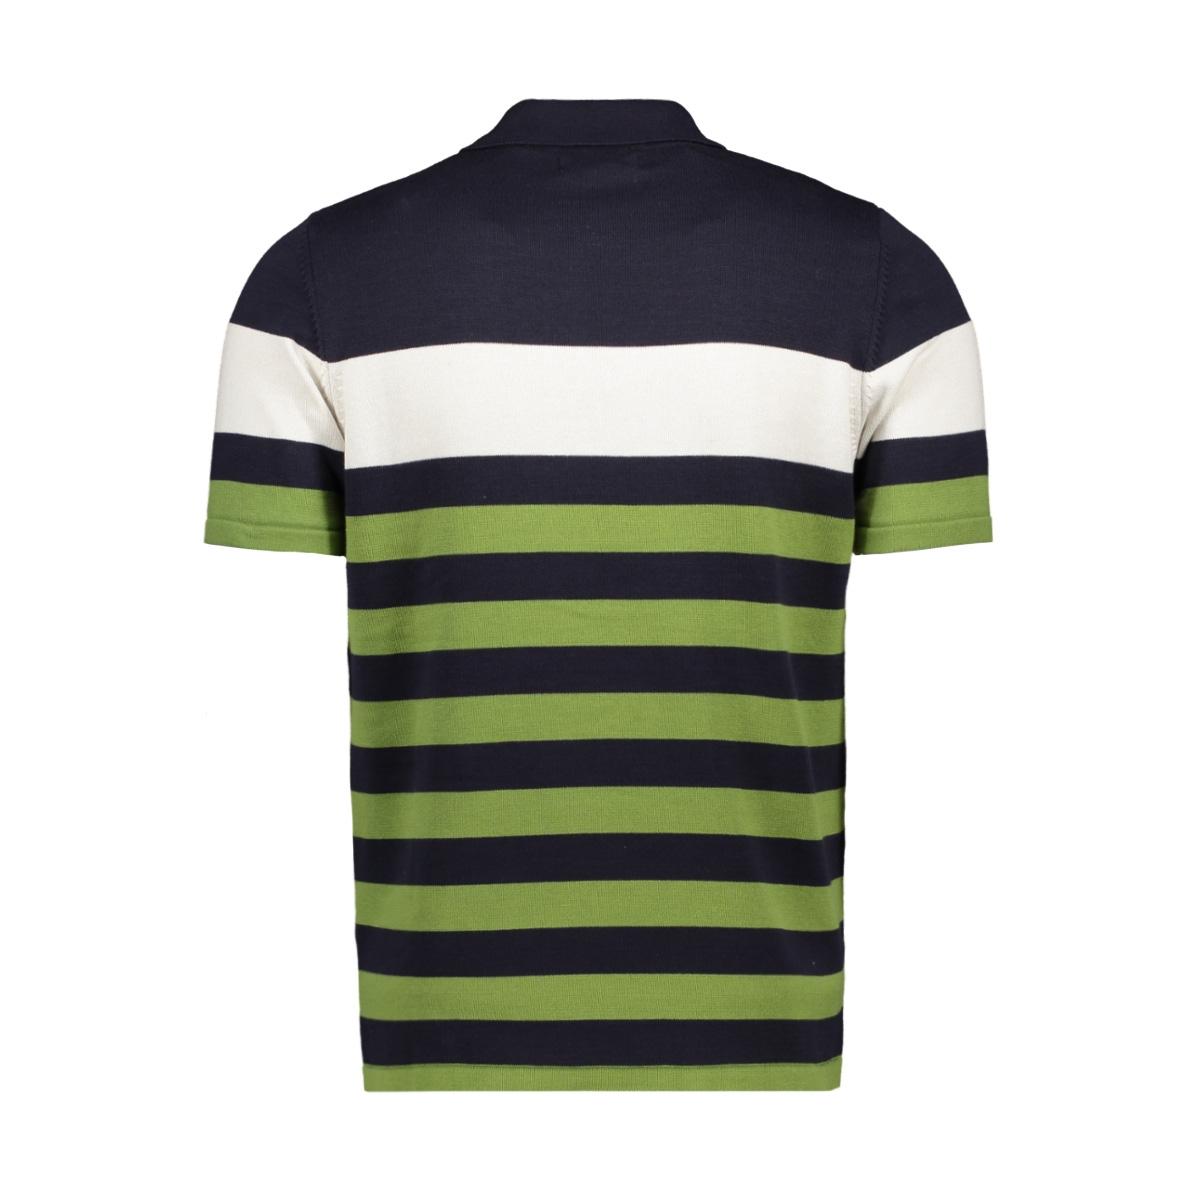 lucca ferlucci polo navy/green stripe